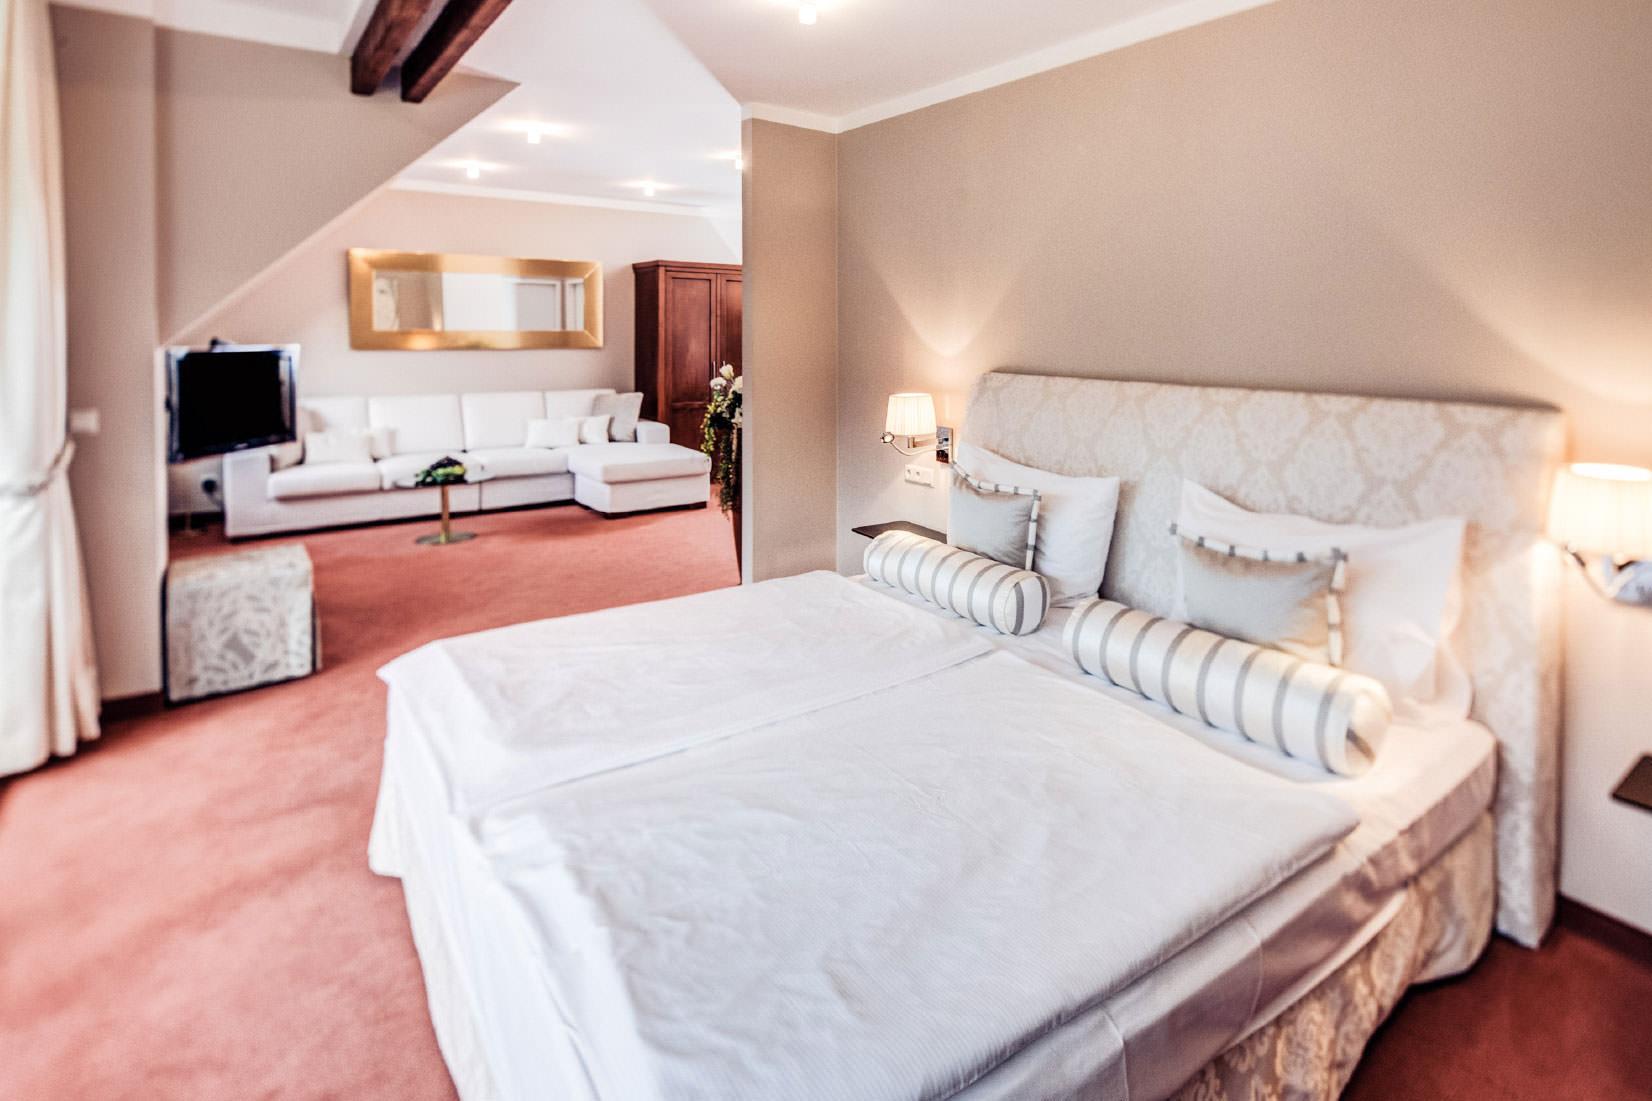 wohnen tagen leben in gumpoldskirchen hotel turmhof de. Black Bedroom Furniture Sets. Home Design Ideas